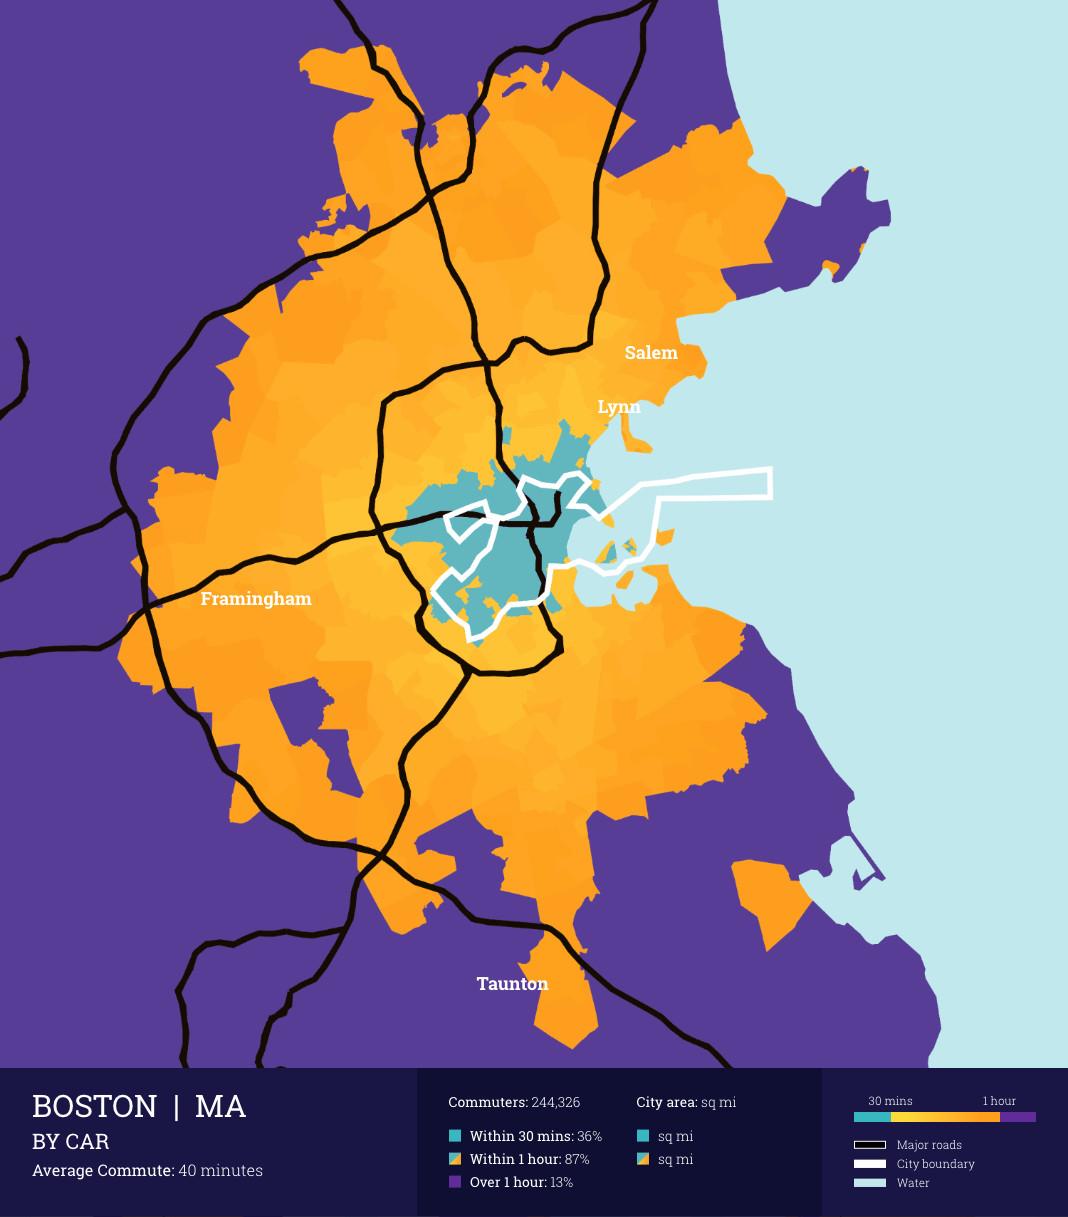 Boston Commute Times Via Car And Public Transit Among Longest In - Us-map-boston-ma